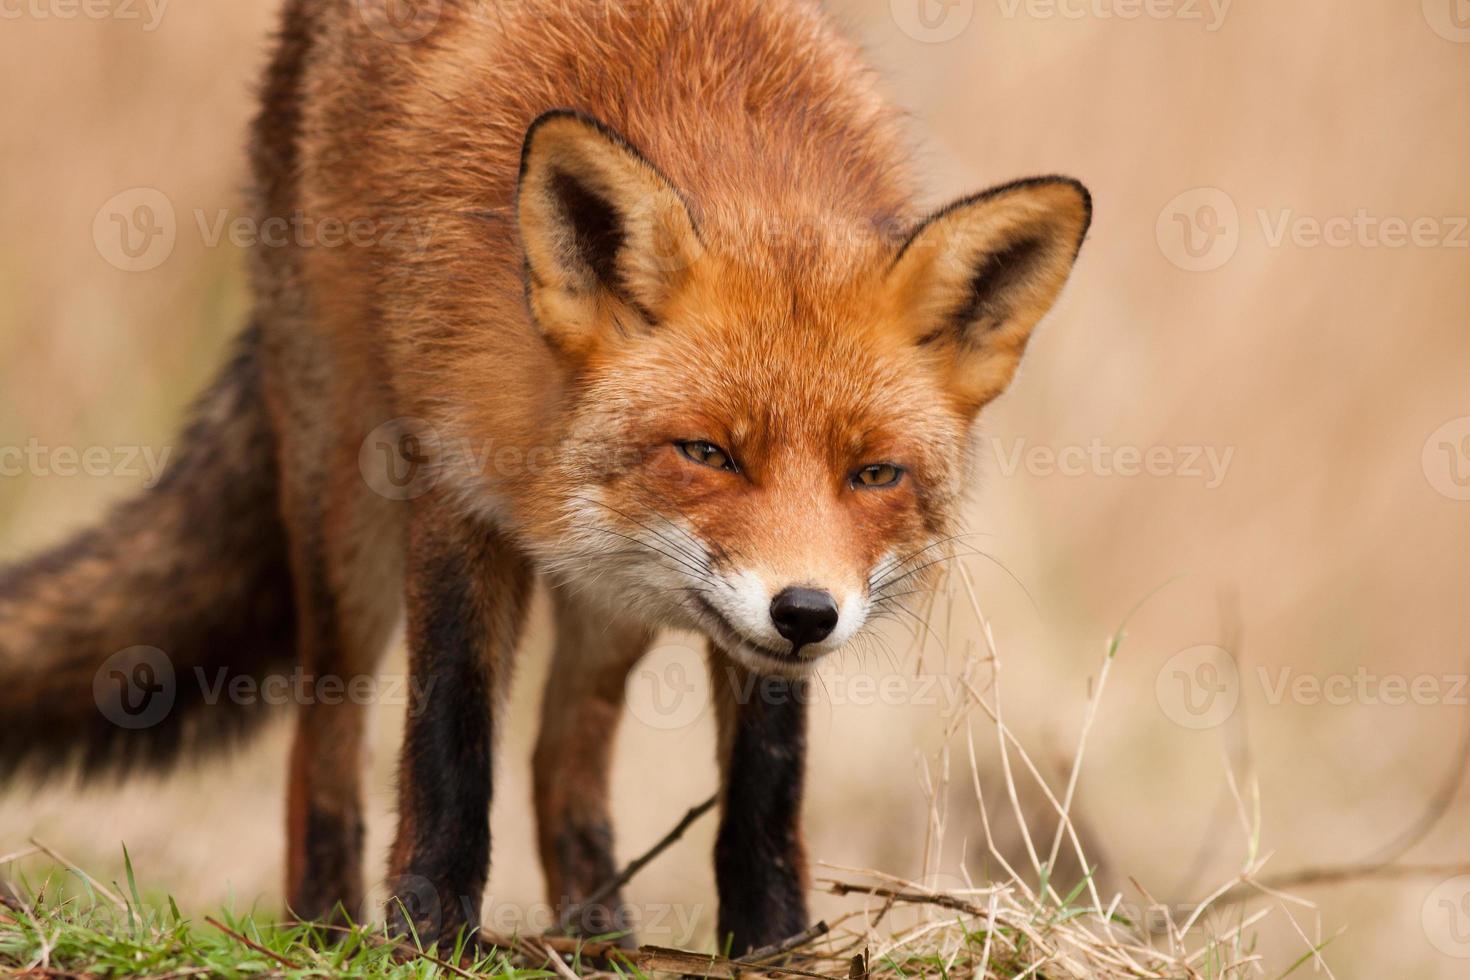 le renard photo